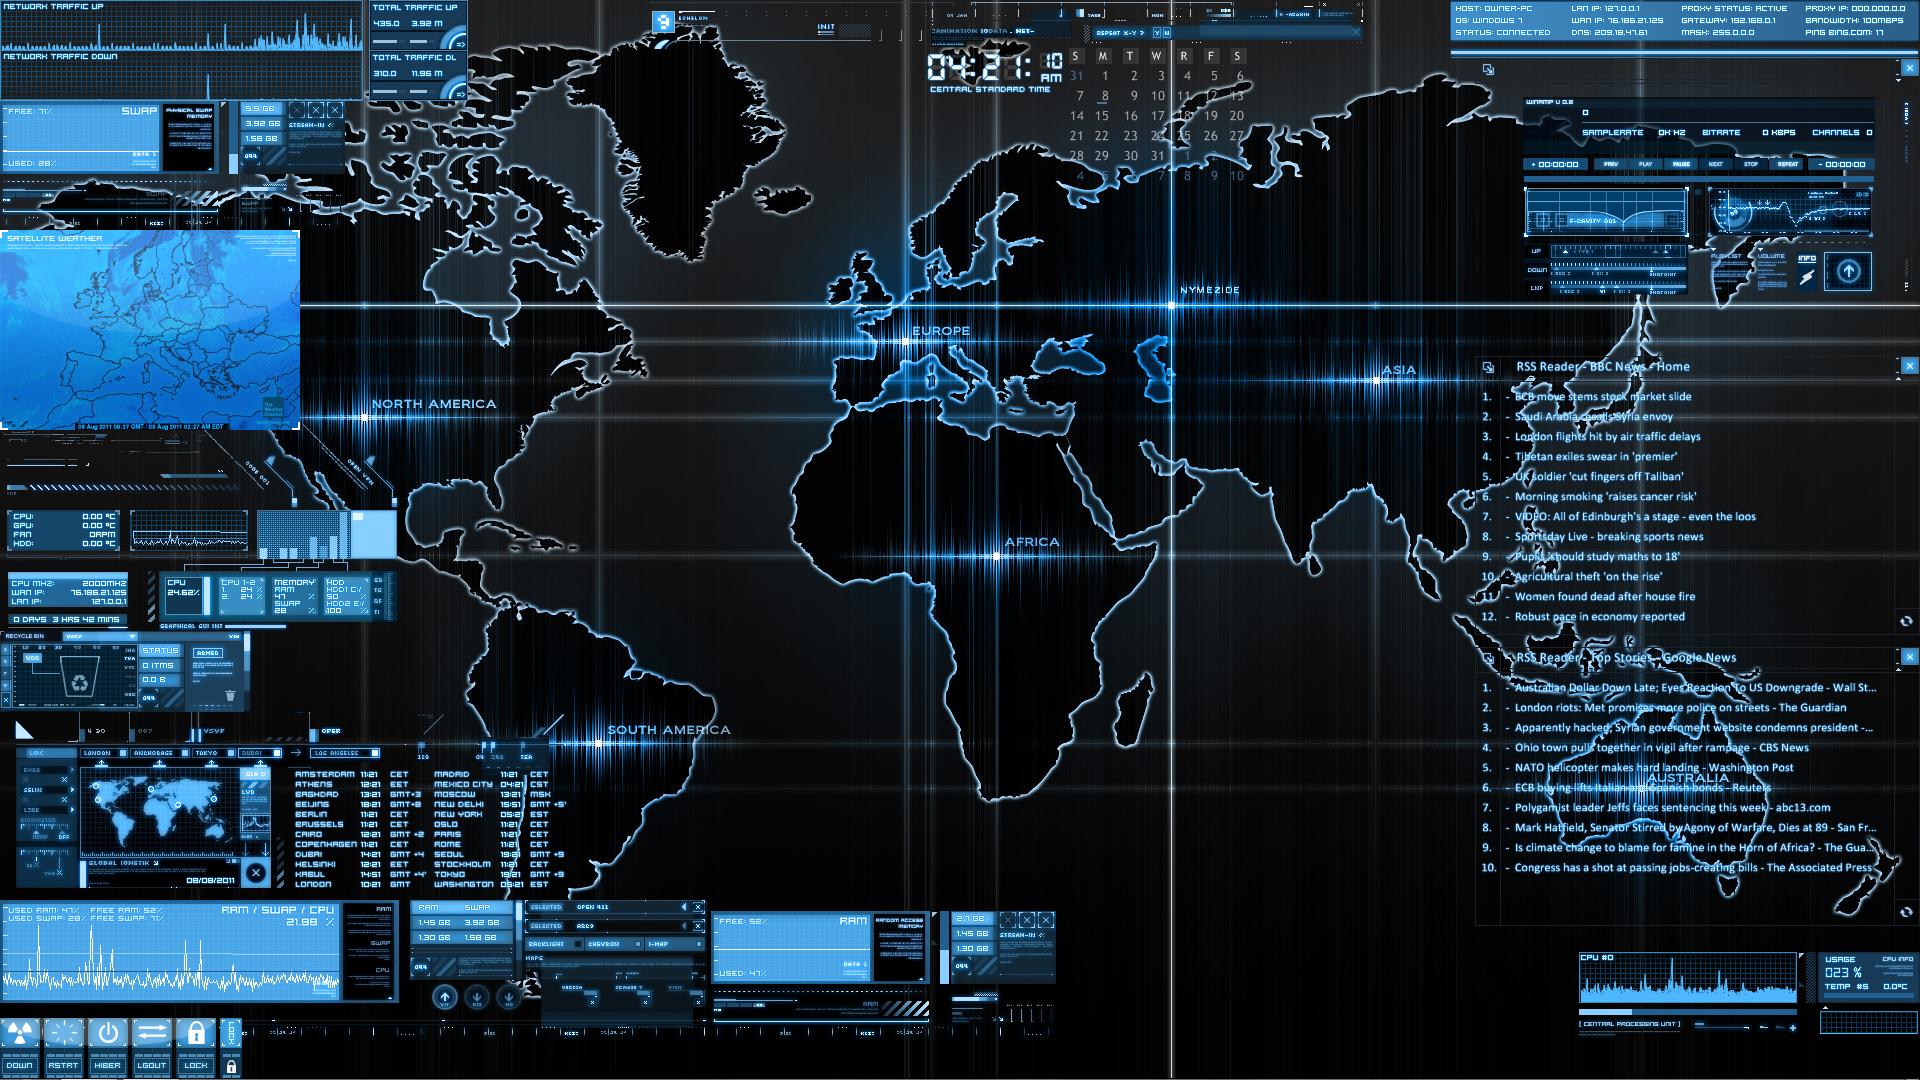 graph wallpaper,electronics,text,technology,digital compositing,font